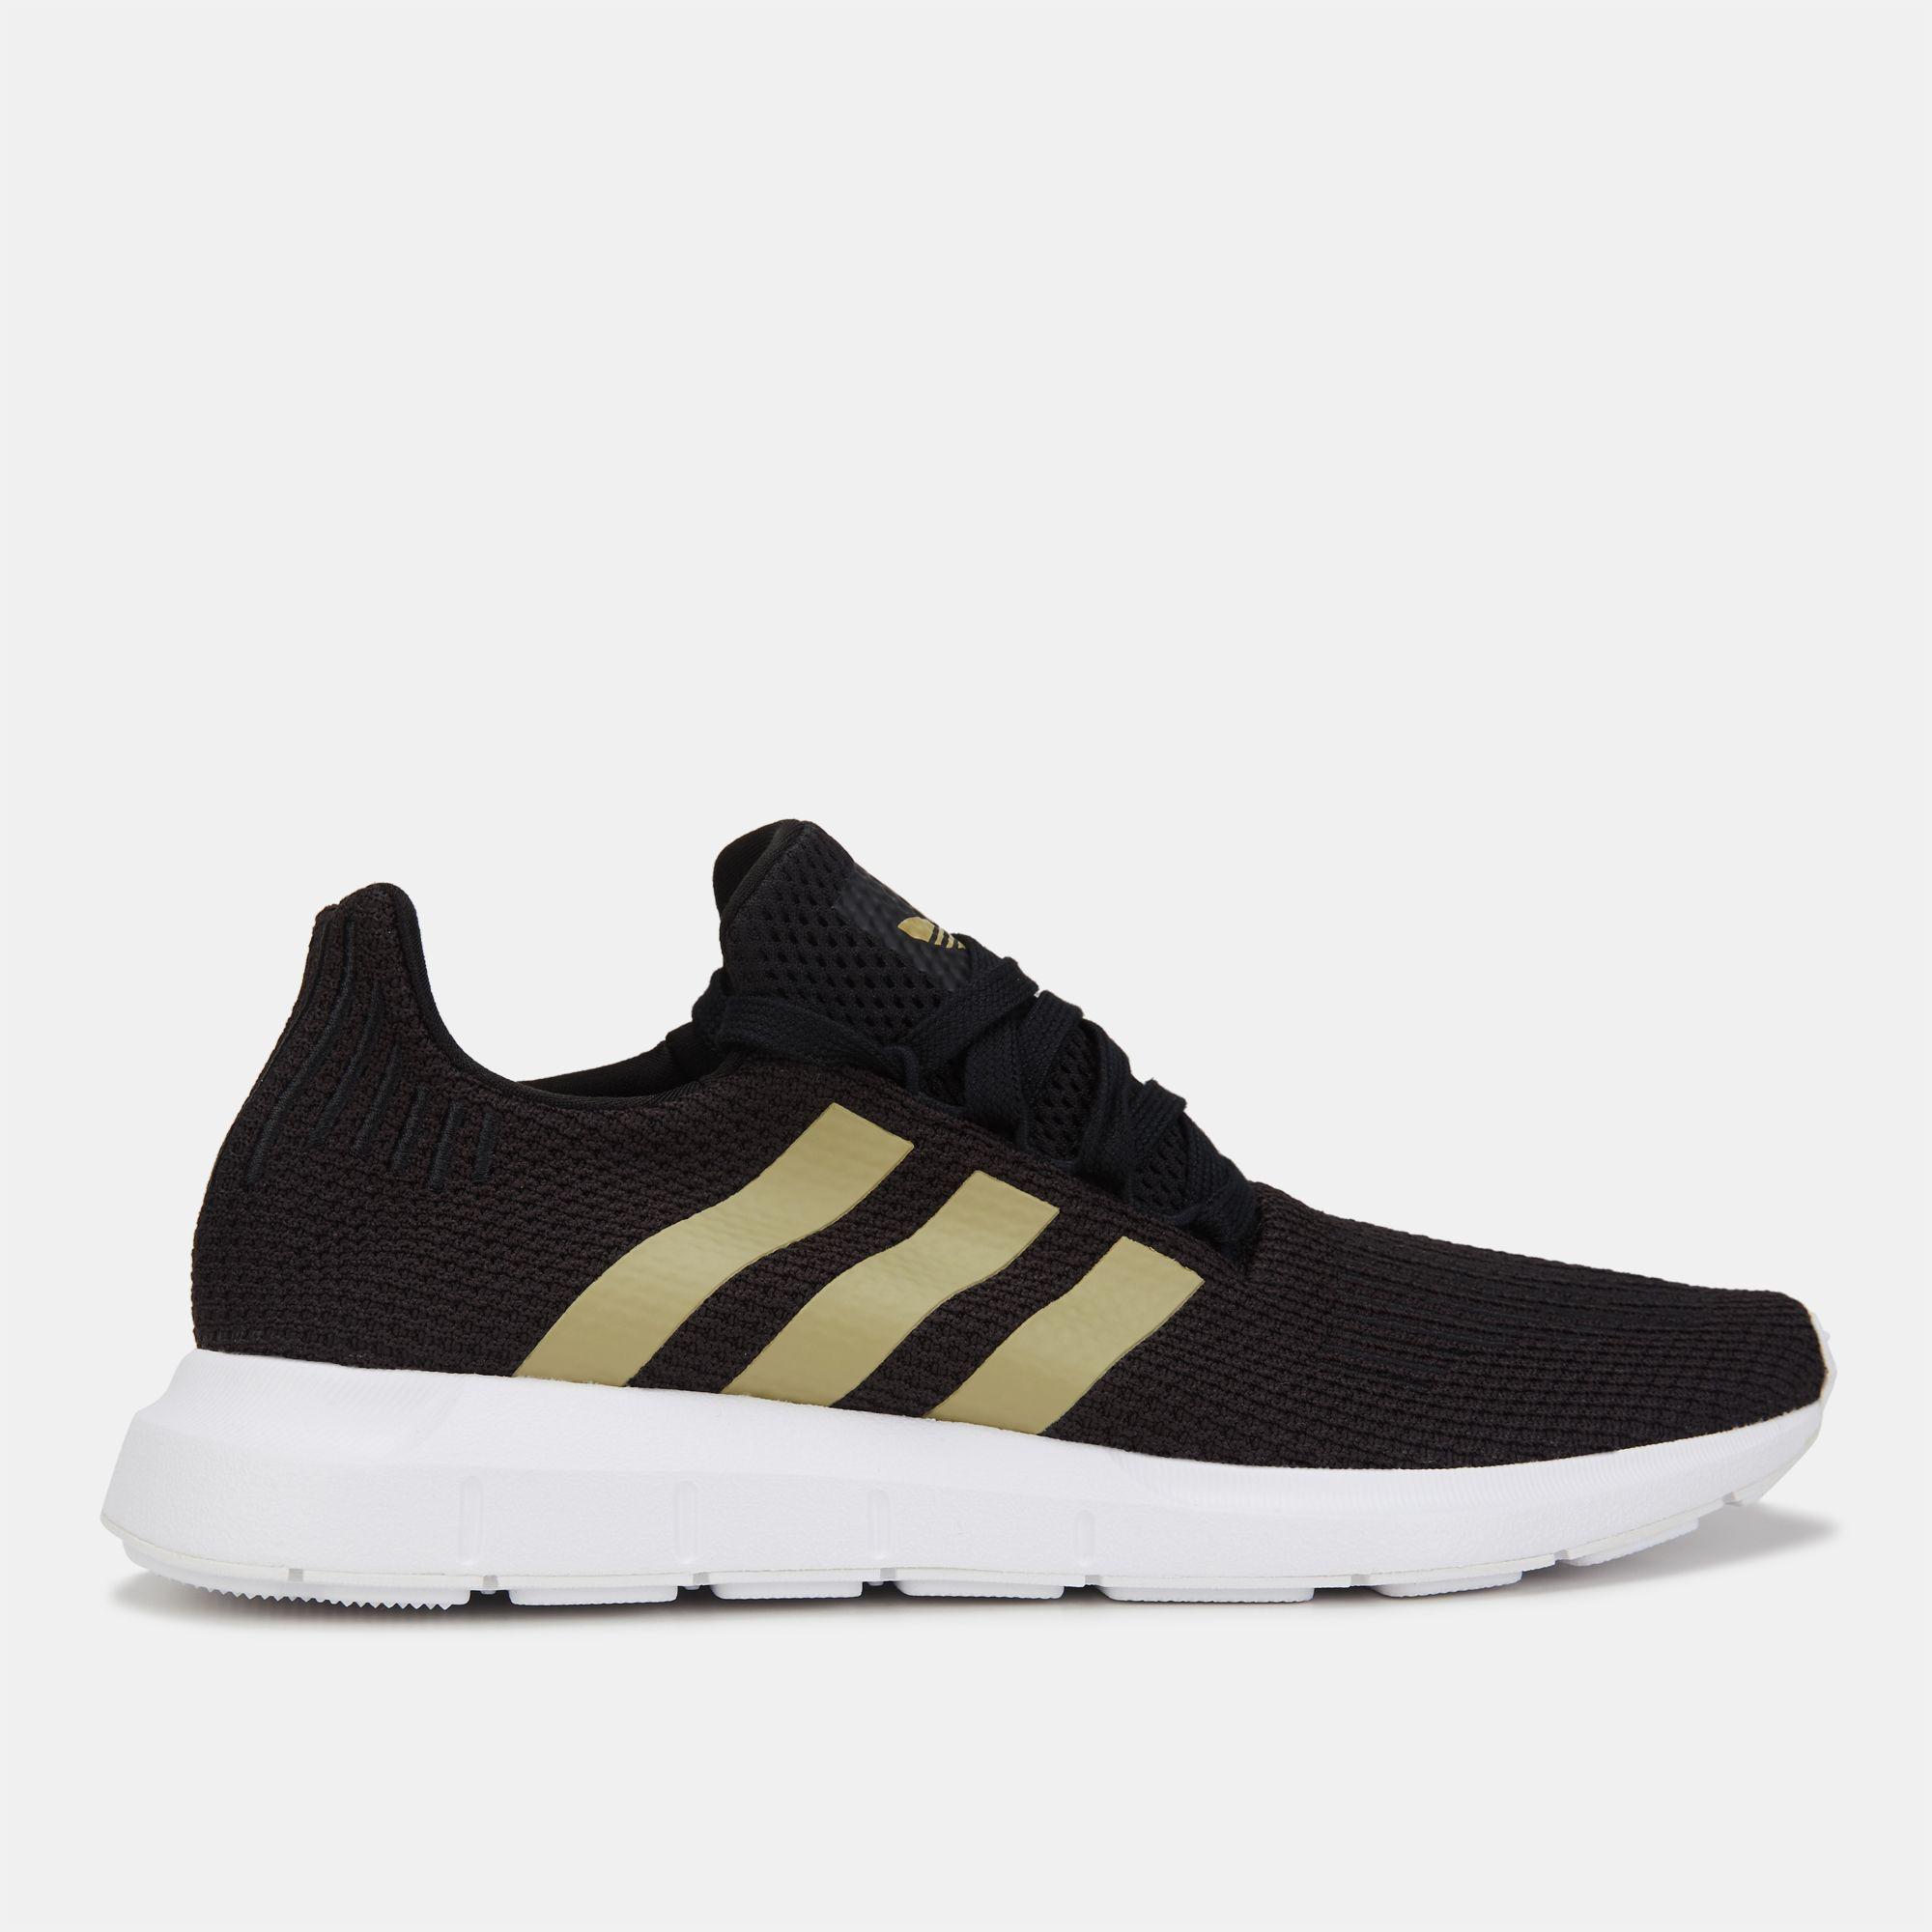 82464e62c23b4 Adidas Originals WoMen s Swift Run Shoe